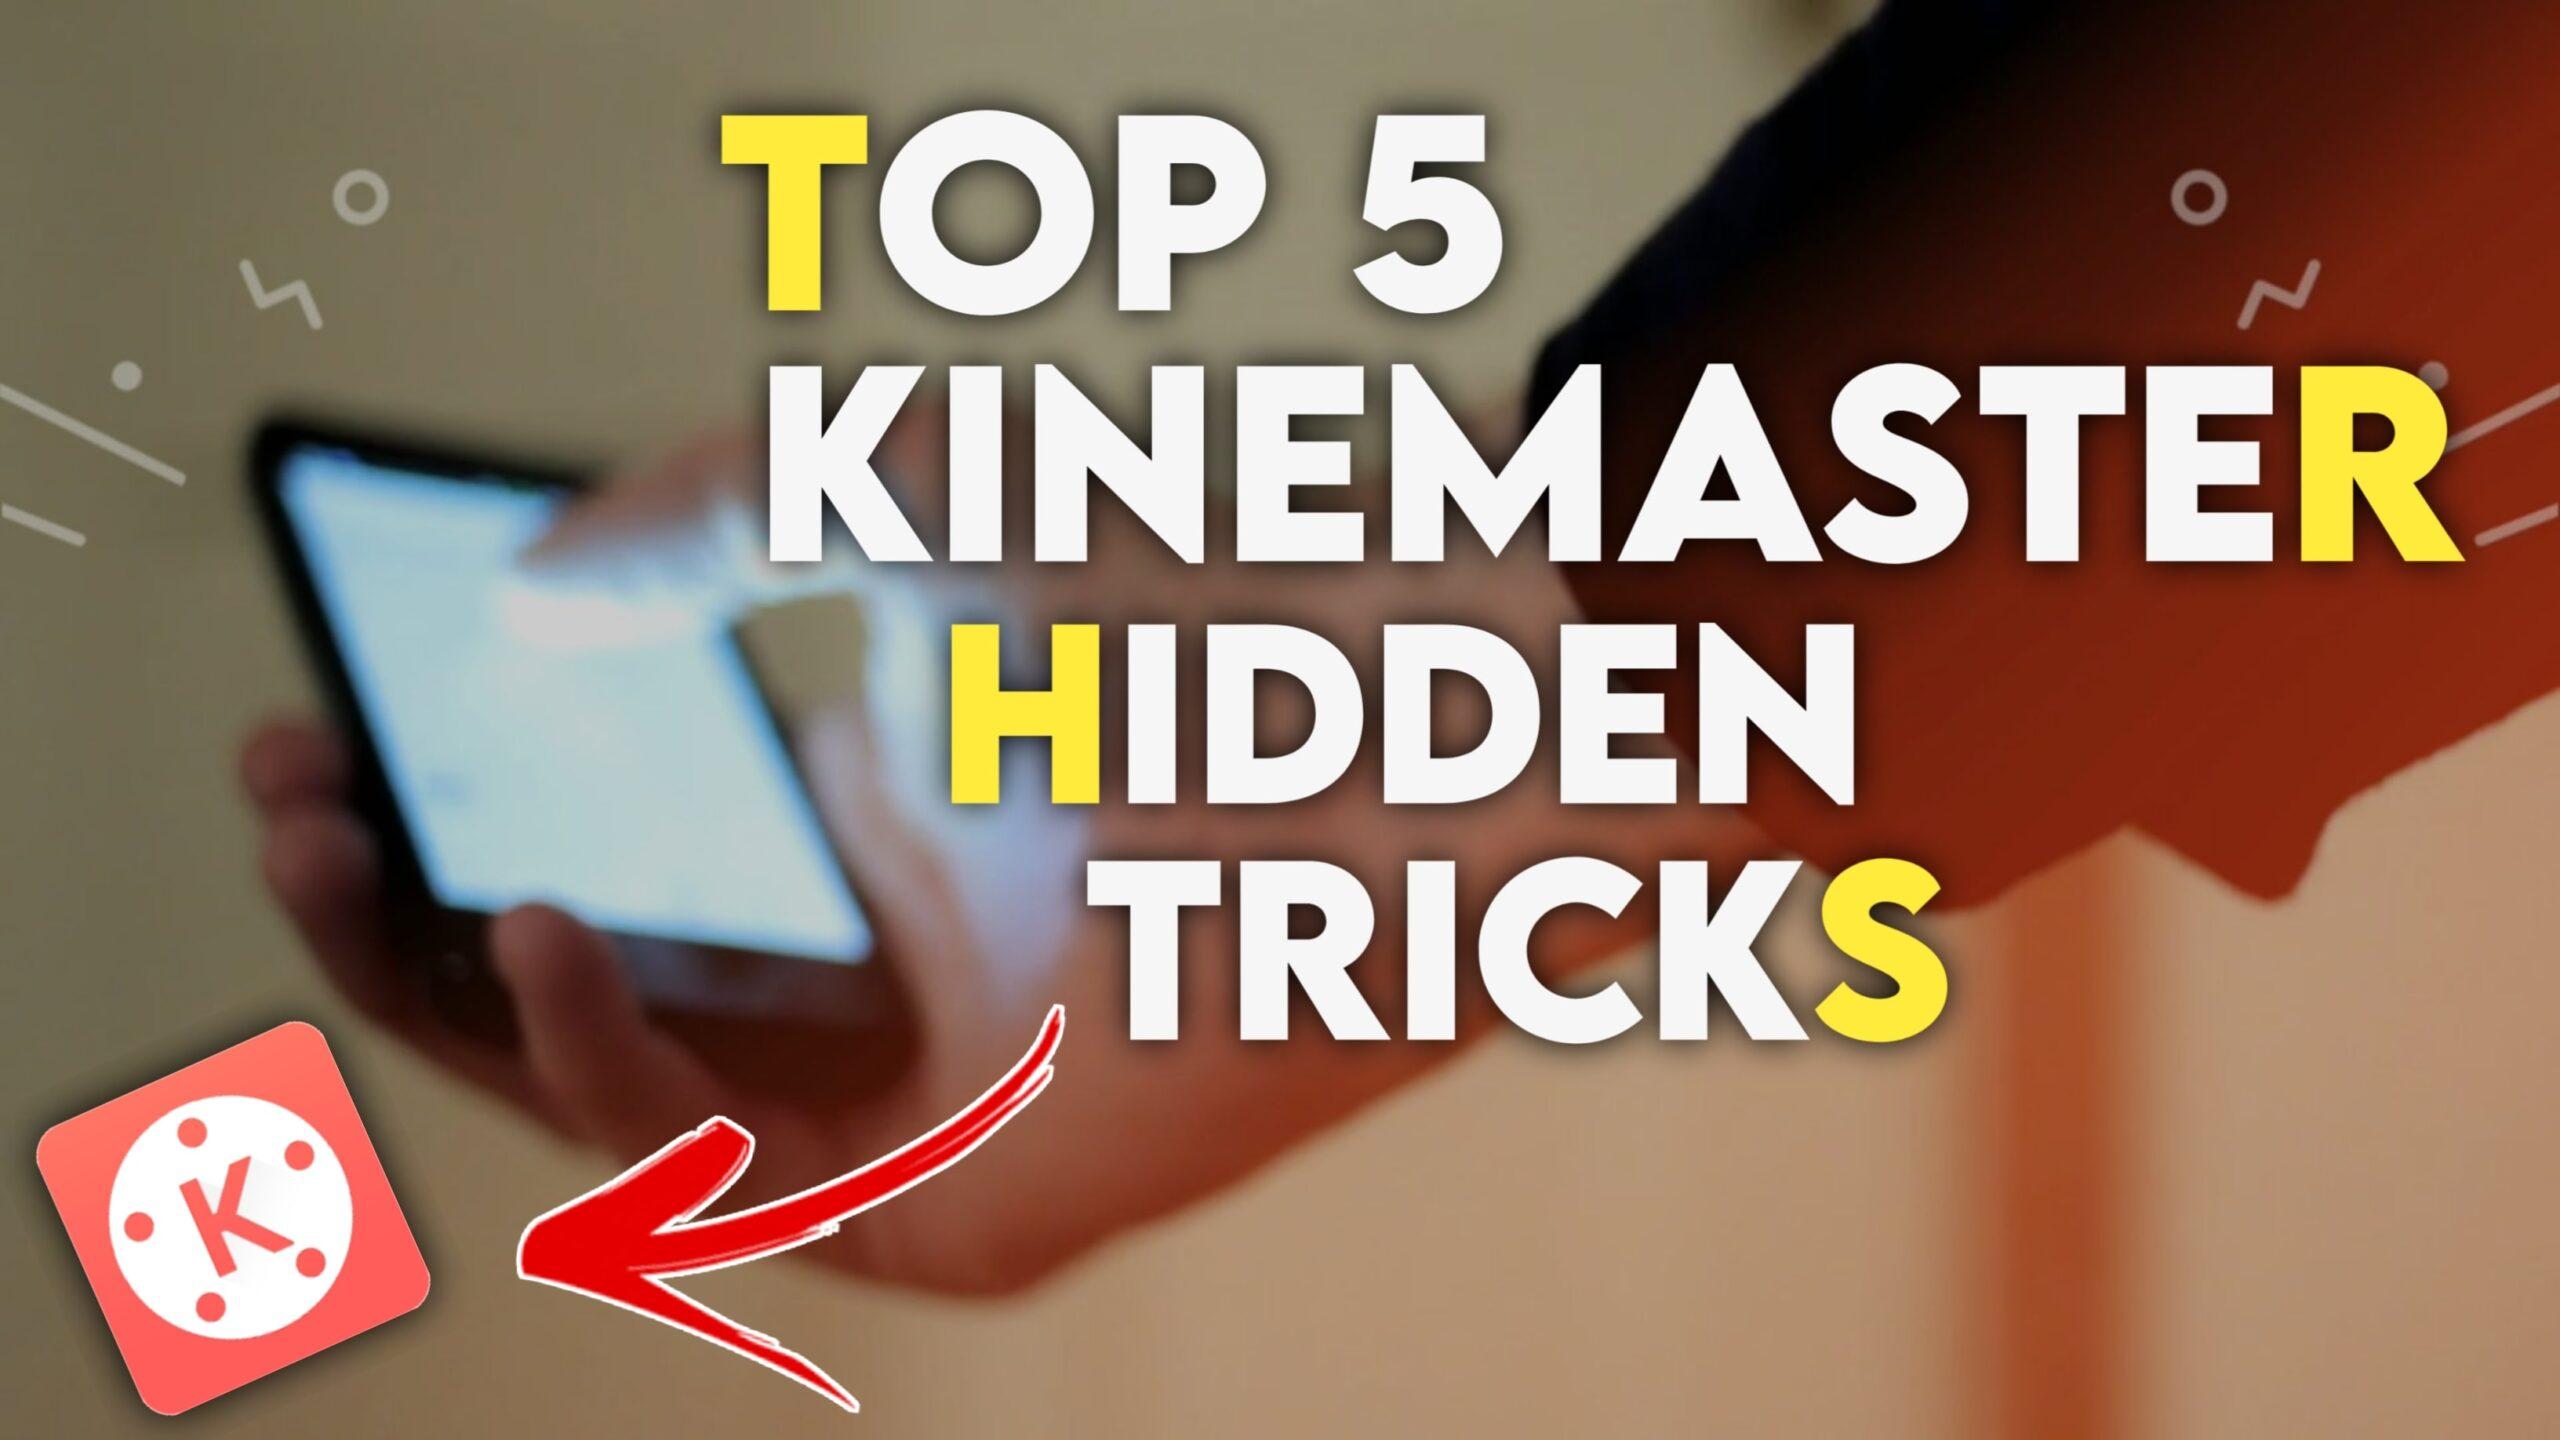 Top 5 Kinemaster Hidden Tricks You Must Know